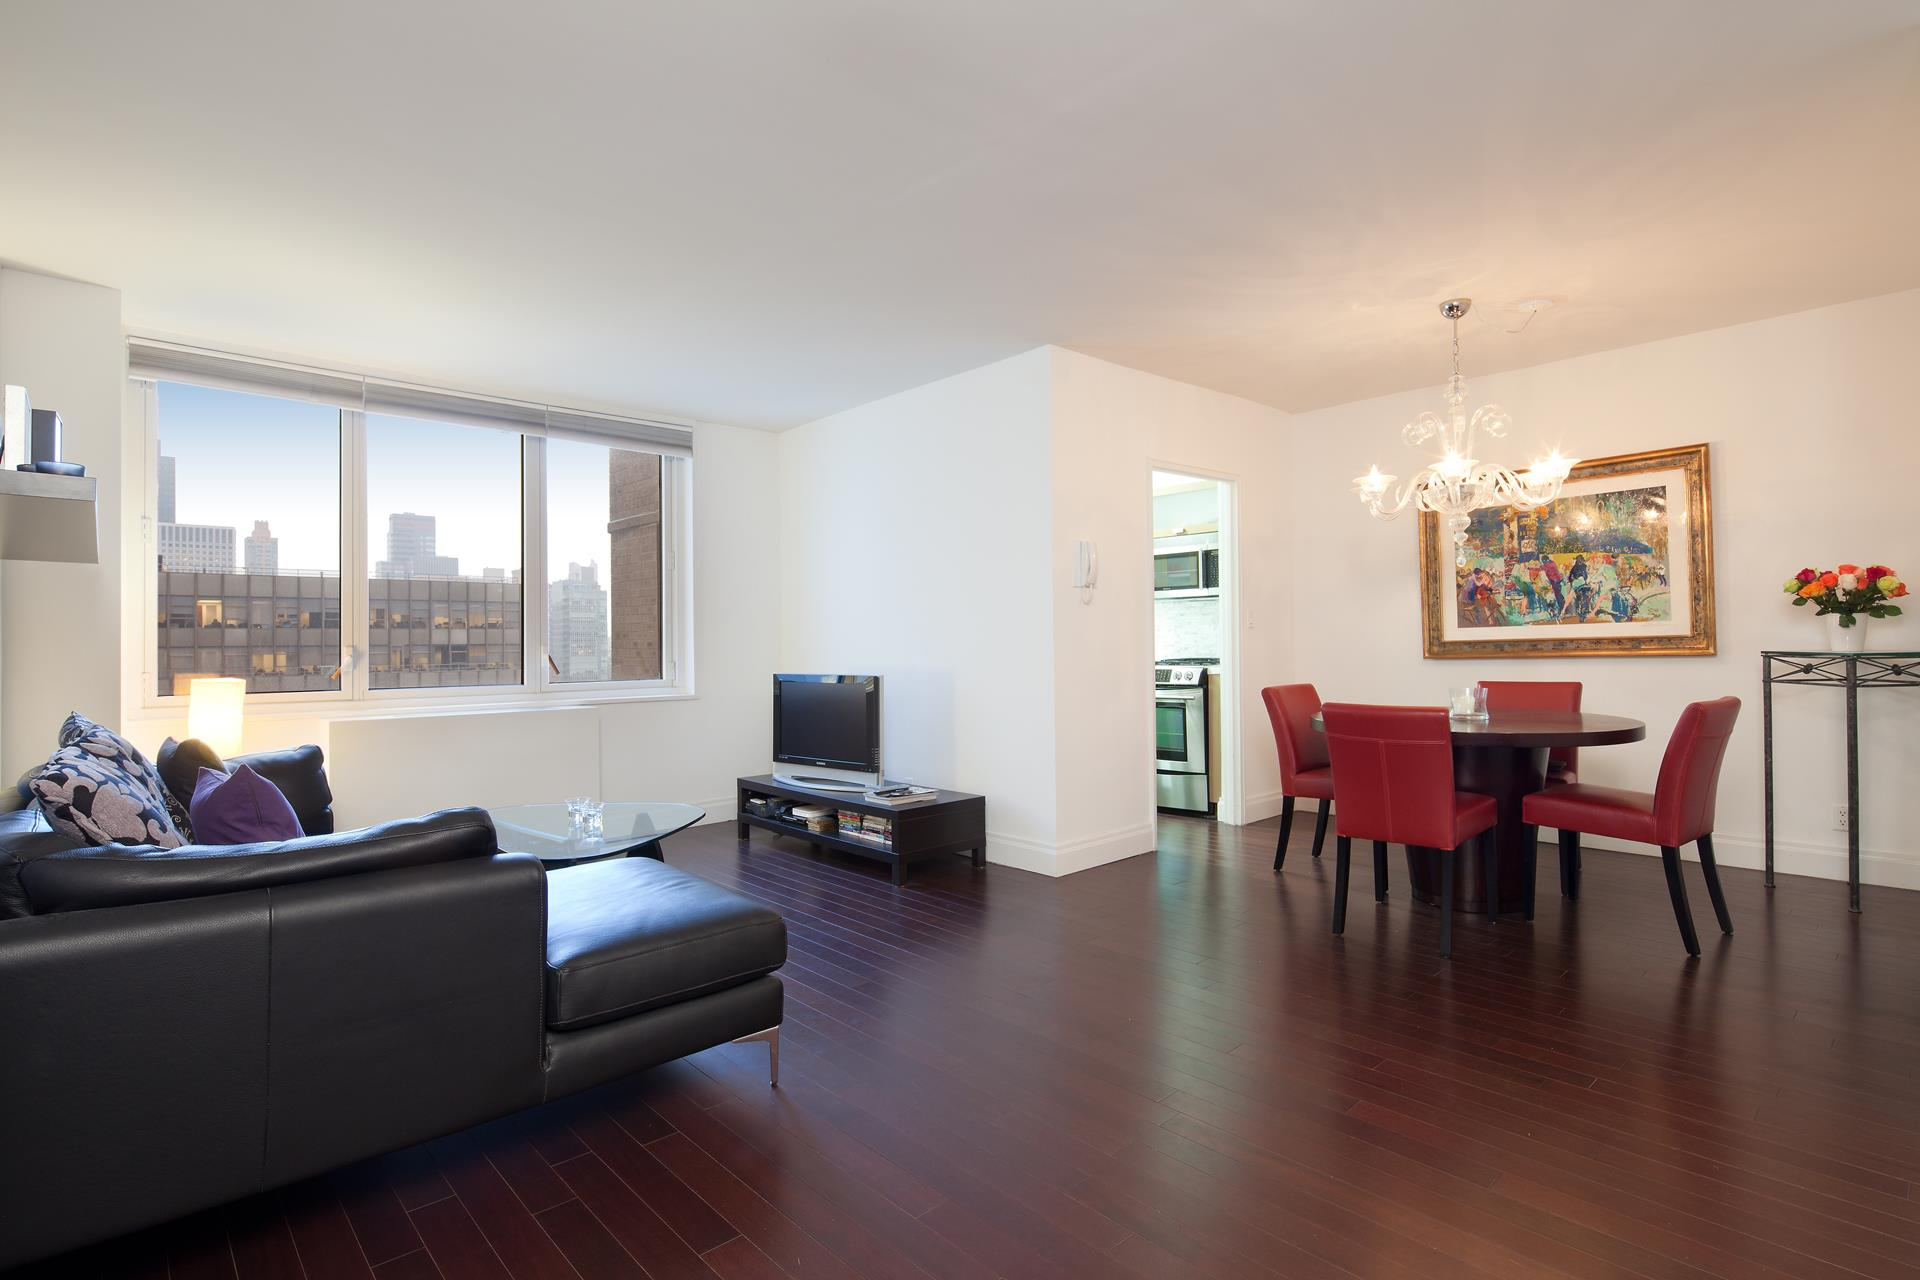 L'Ecole Condominium, 212 East 47th St, 27B - Turtle Bay, New York